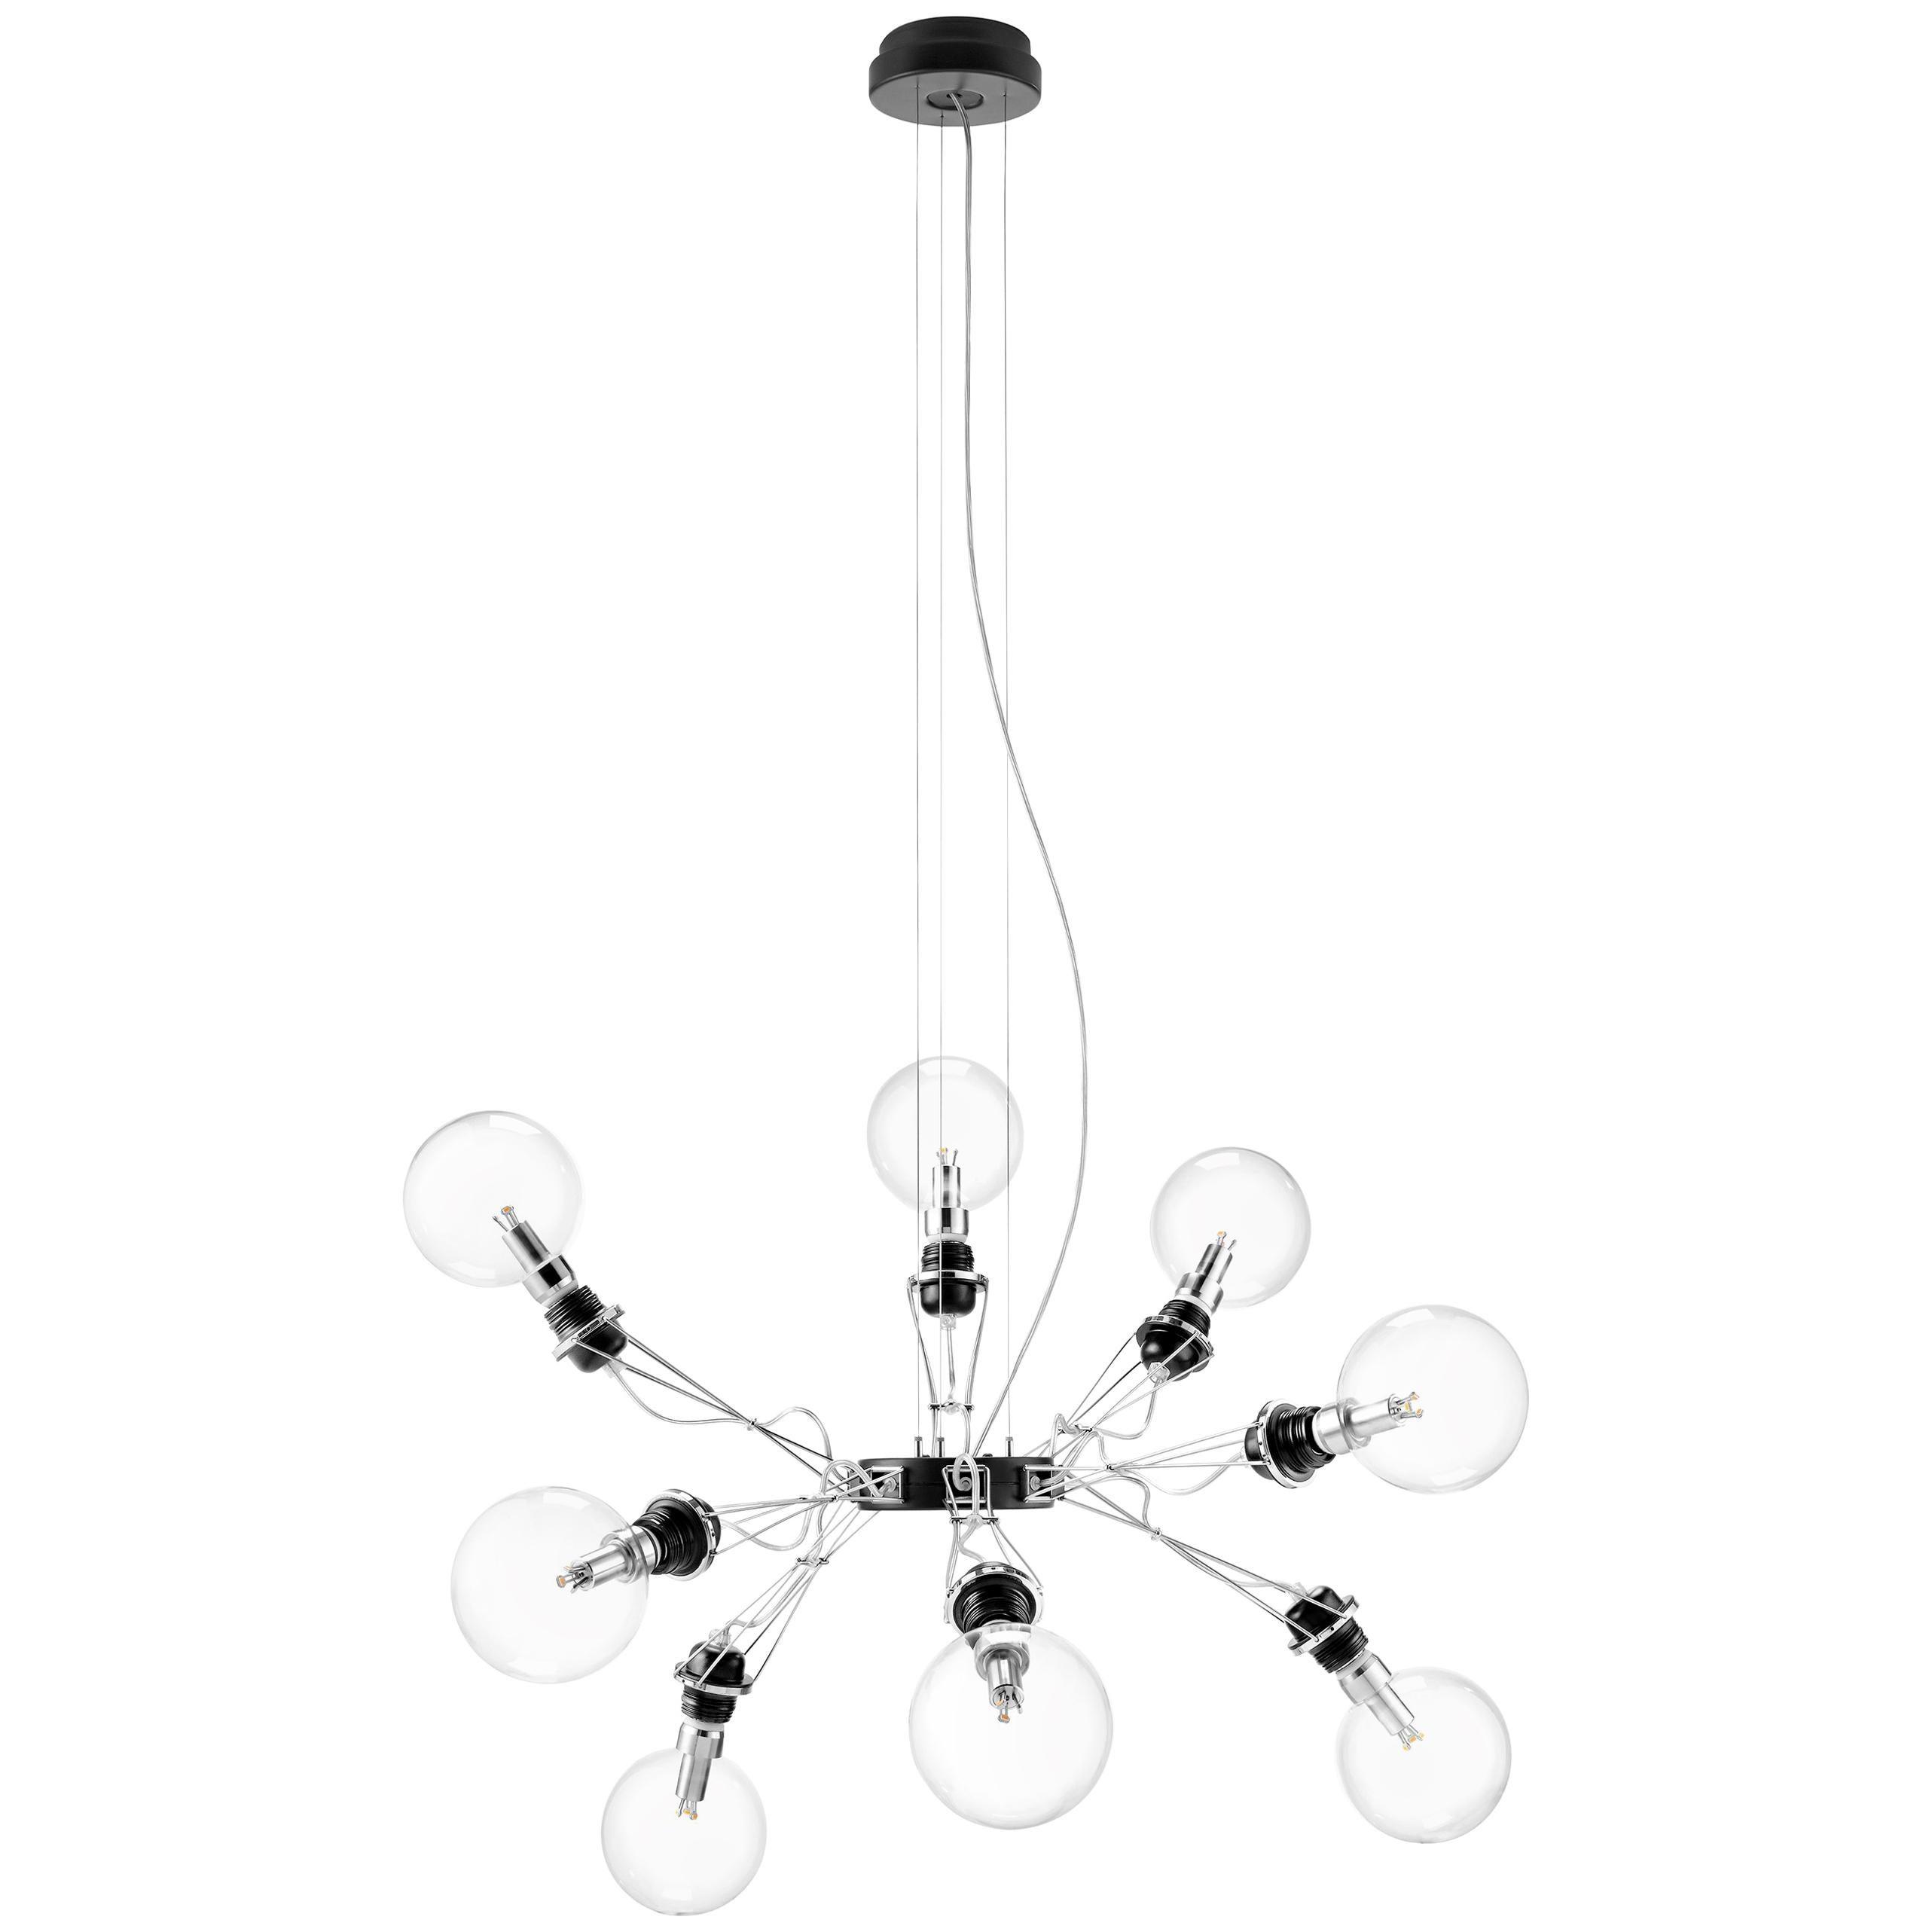 Lumina Matrix Otto Suspension Lamp in Black by Yaacov Kaufman